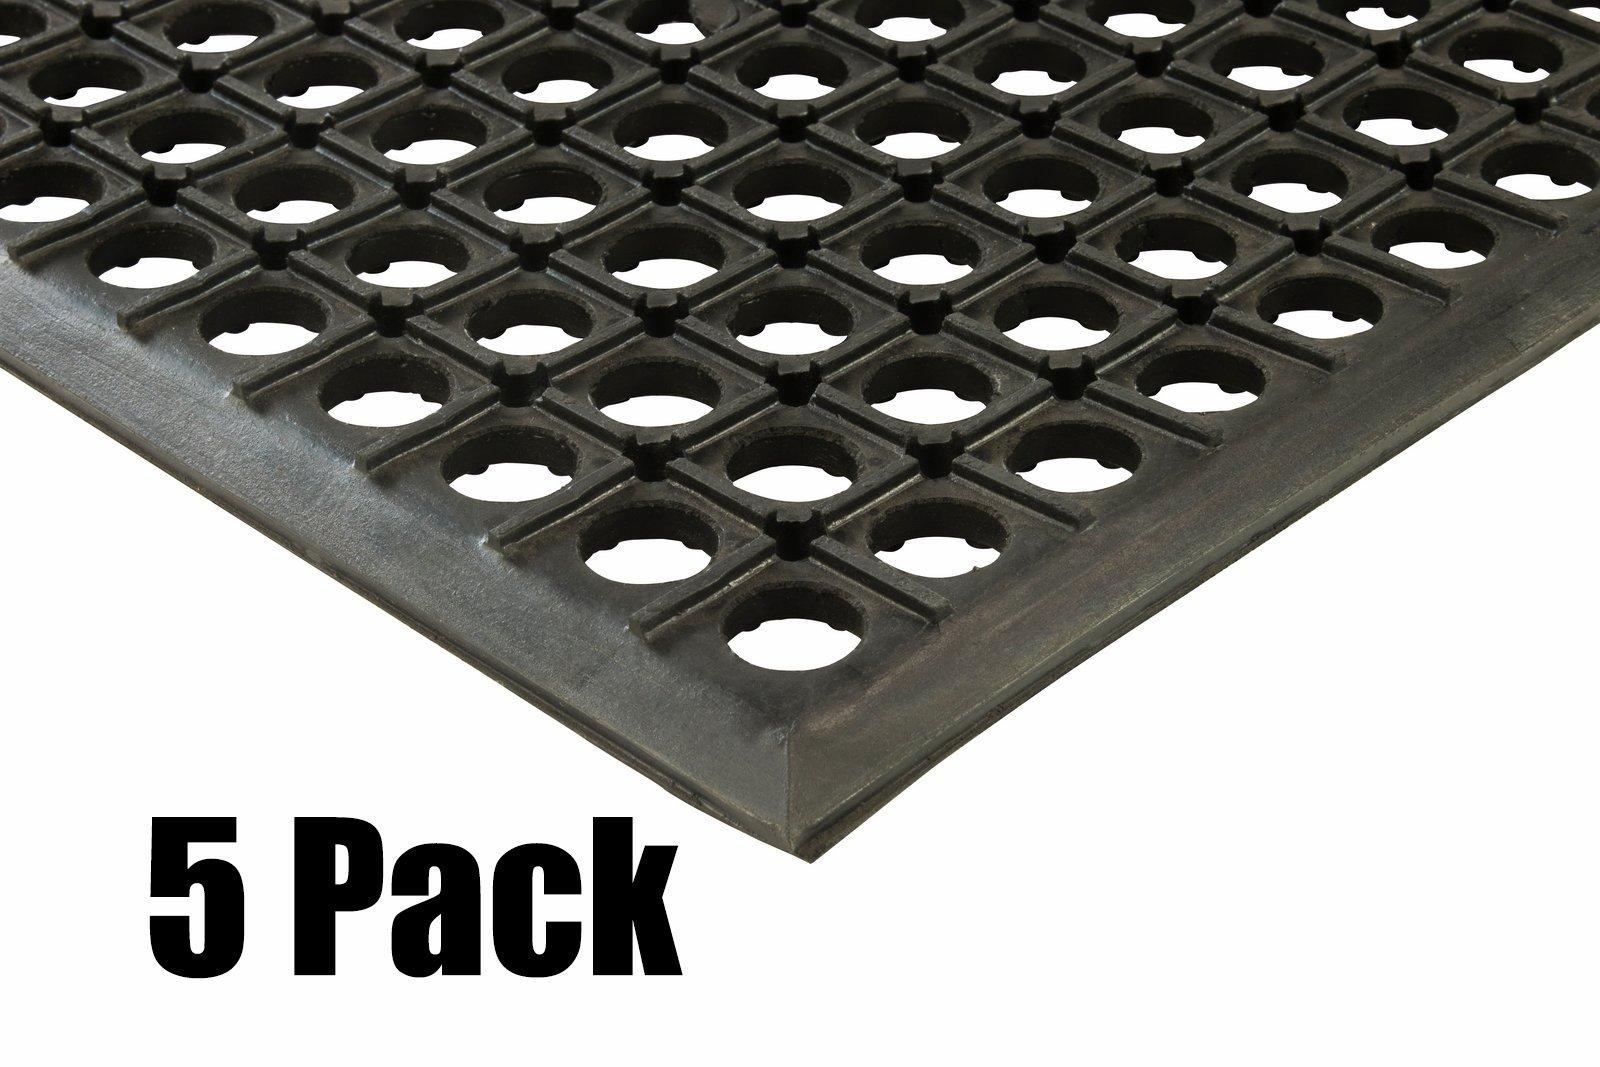 (5) Erie Tools 3x5 Rubber Drainage Floor Mat 36'' x 60'' Anti-Fatigue Anti-slip